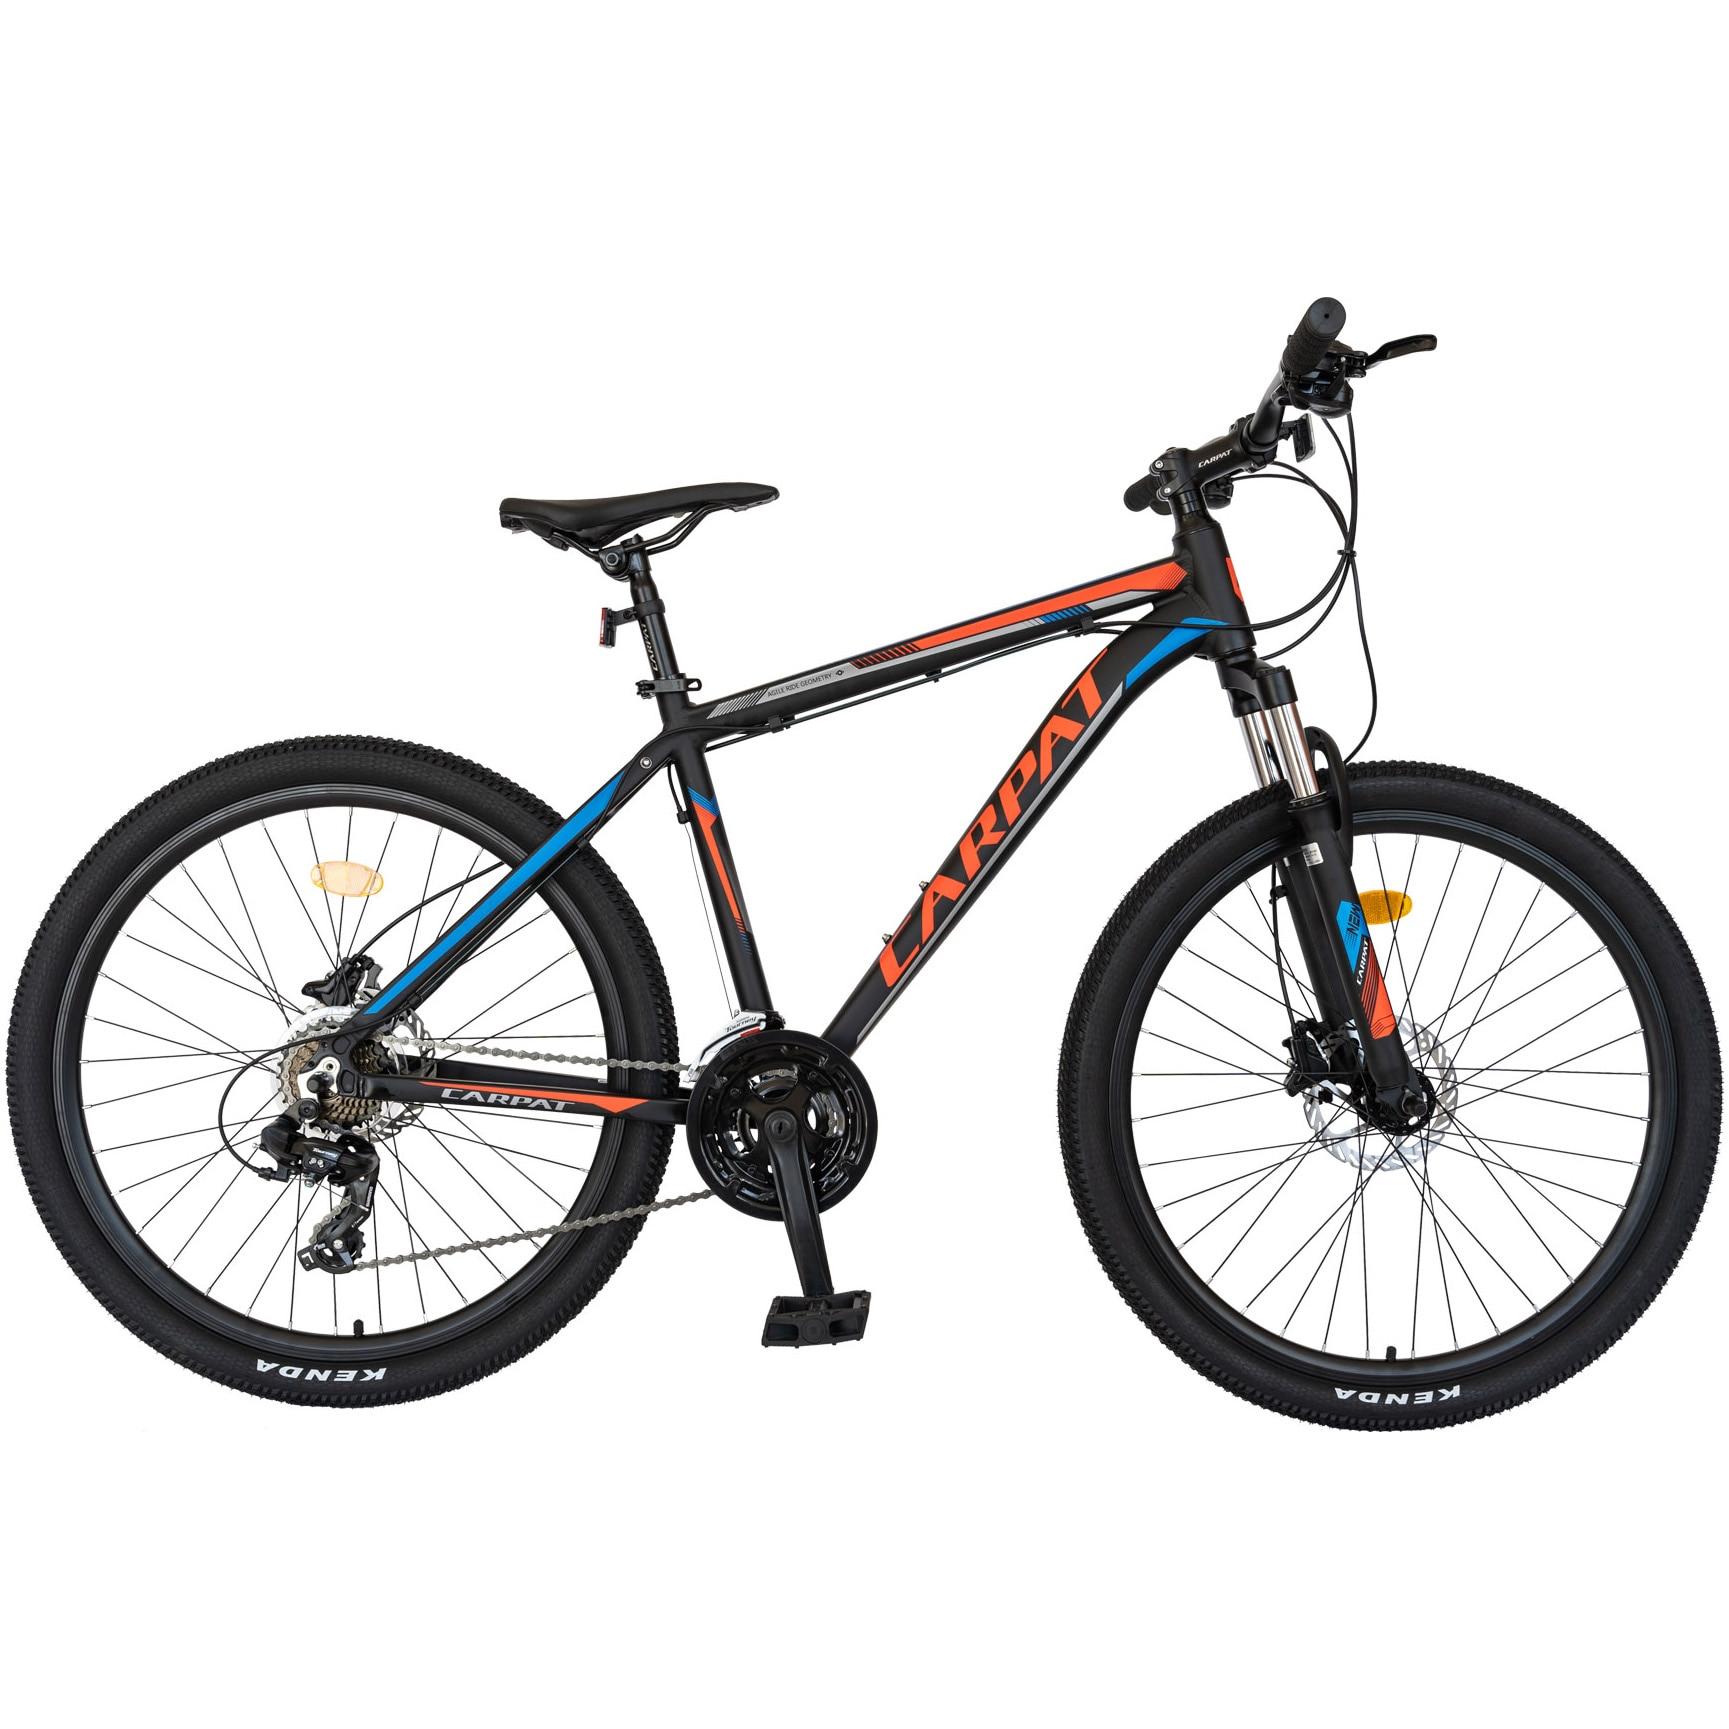 "Fotografie Bicicleta MTB Carpat C2681H 26"", frana Hidraulica pe disc, transmisie full Shimano, 26"", negru/rosu"